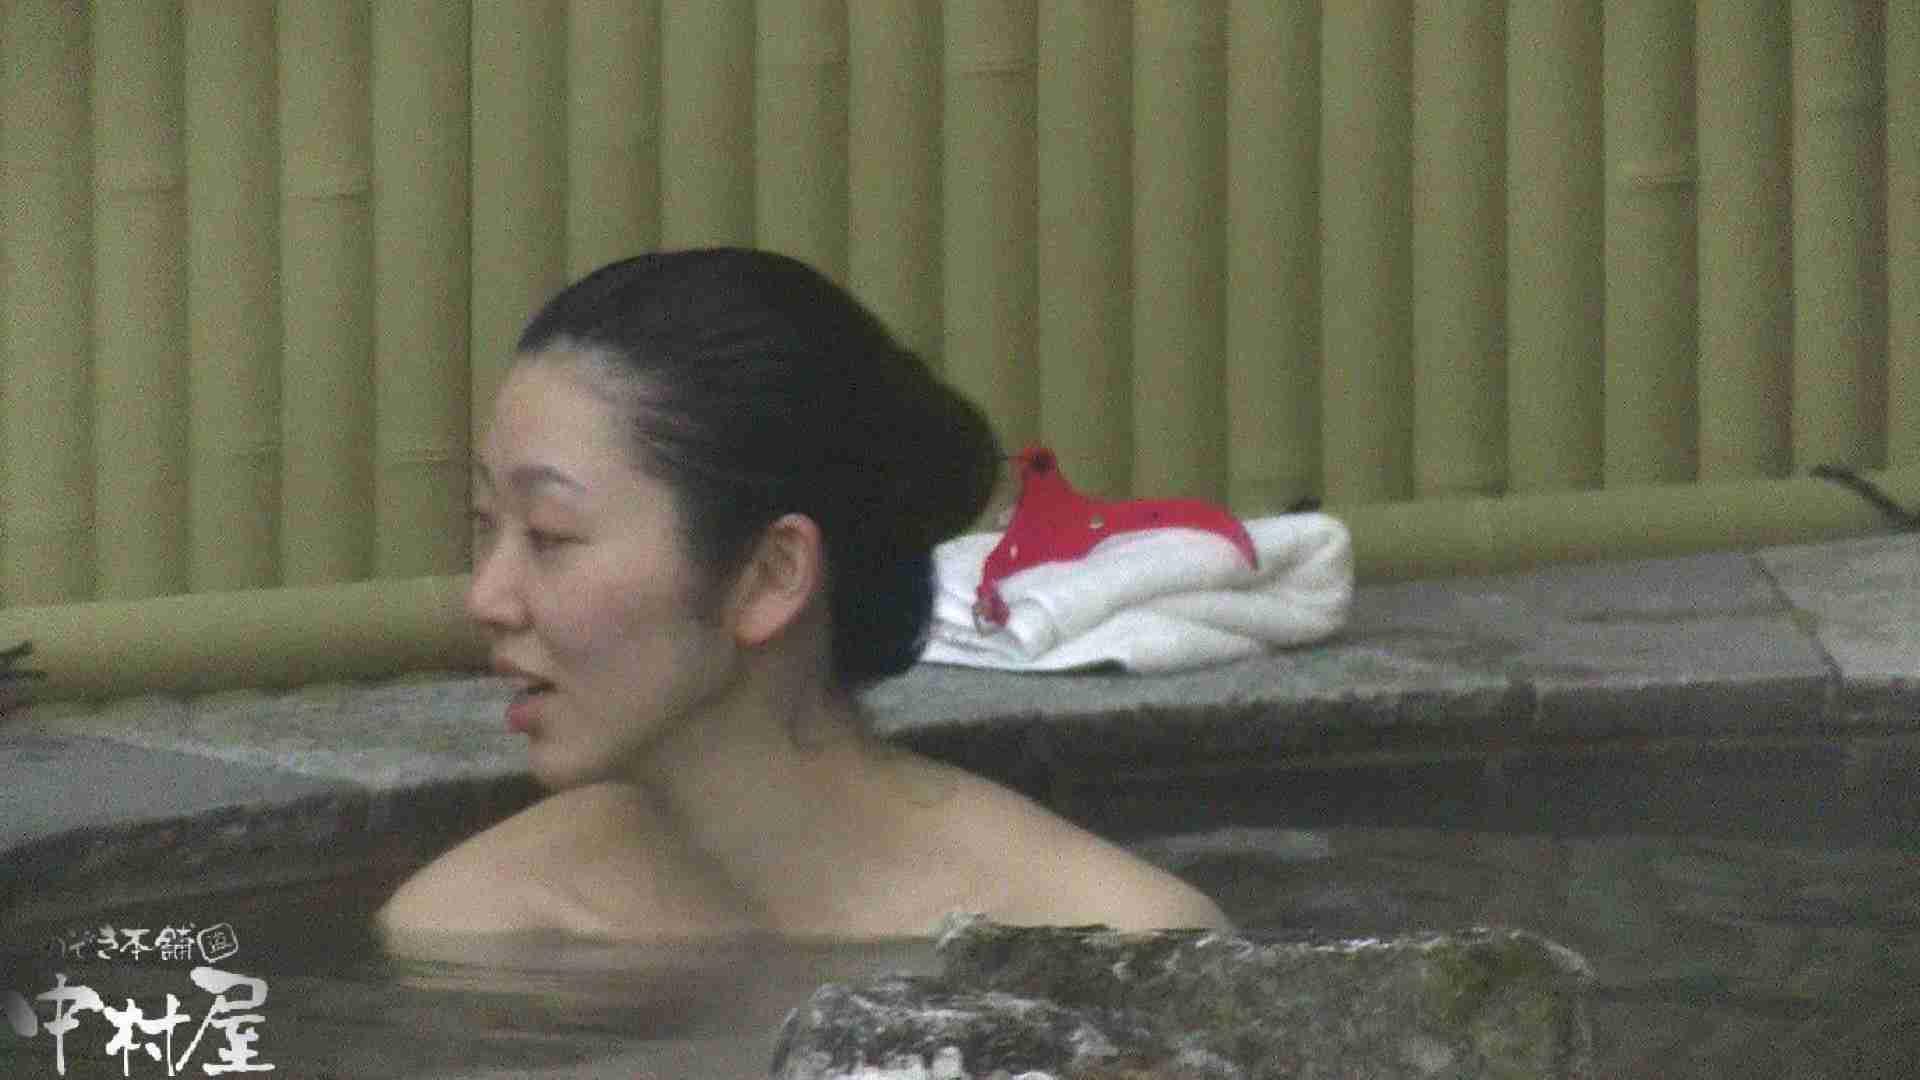 Aquaな露天風呂Vol.917 盗撮シリーズ   露天風呂編  108PIX 75